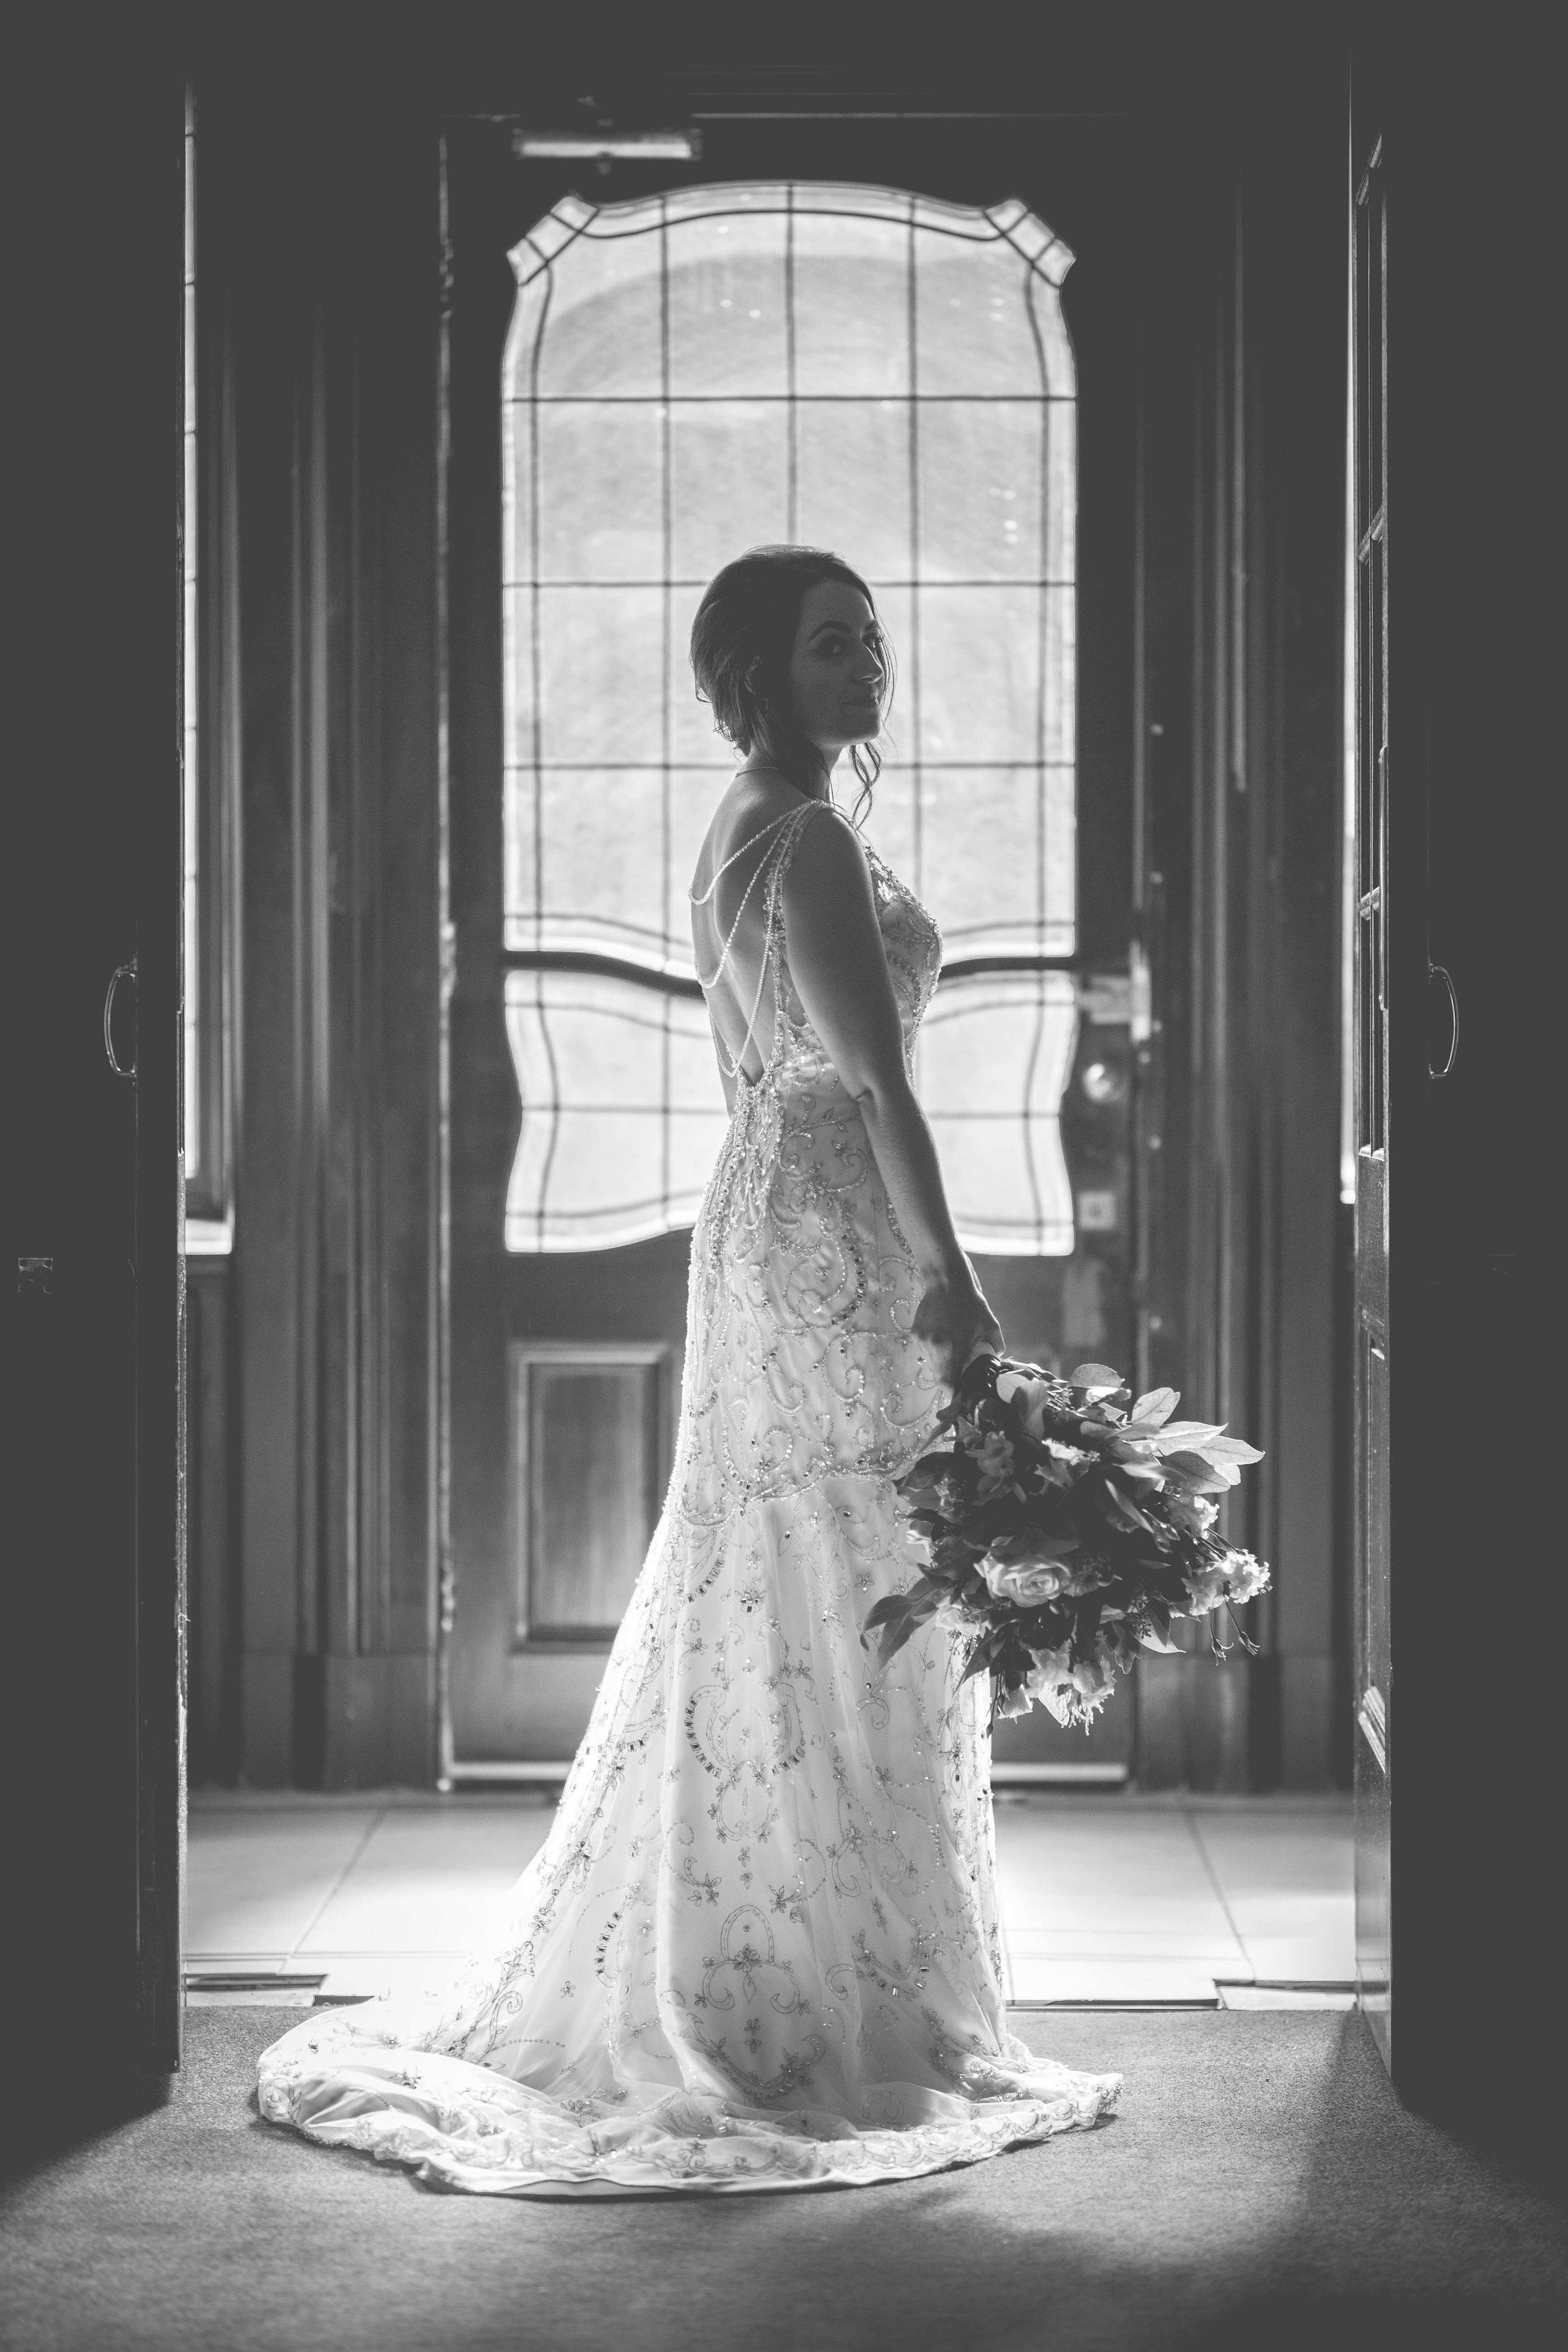 Northern Ireland Wedding Photographer | Brian McEwan Photography | Affordable Wedding Photography Throughout Antrim Down Armagh Tyrone Londonderry Derry Down Fermanagh -22.jpg